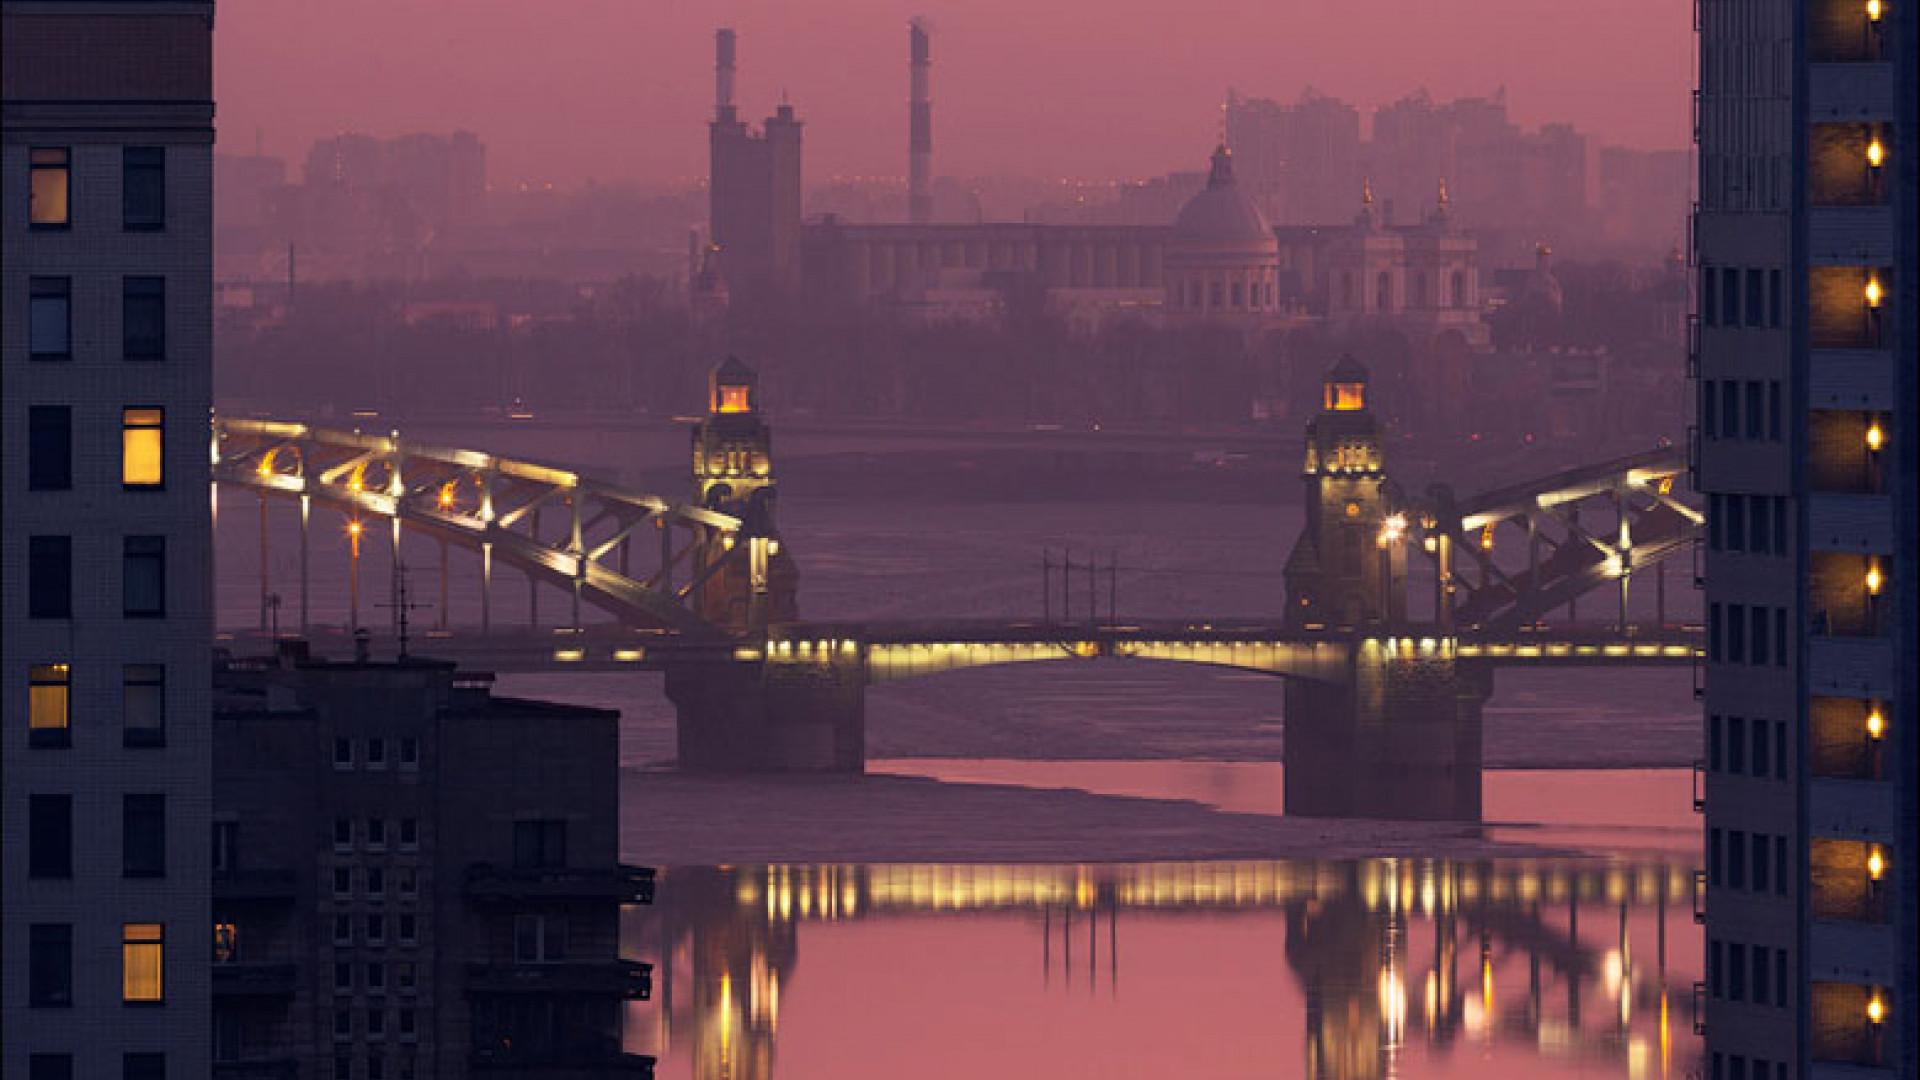 130687275837329070_Ivan-Turukhano_Russia_Shortlist_Youth_Environment_2015